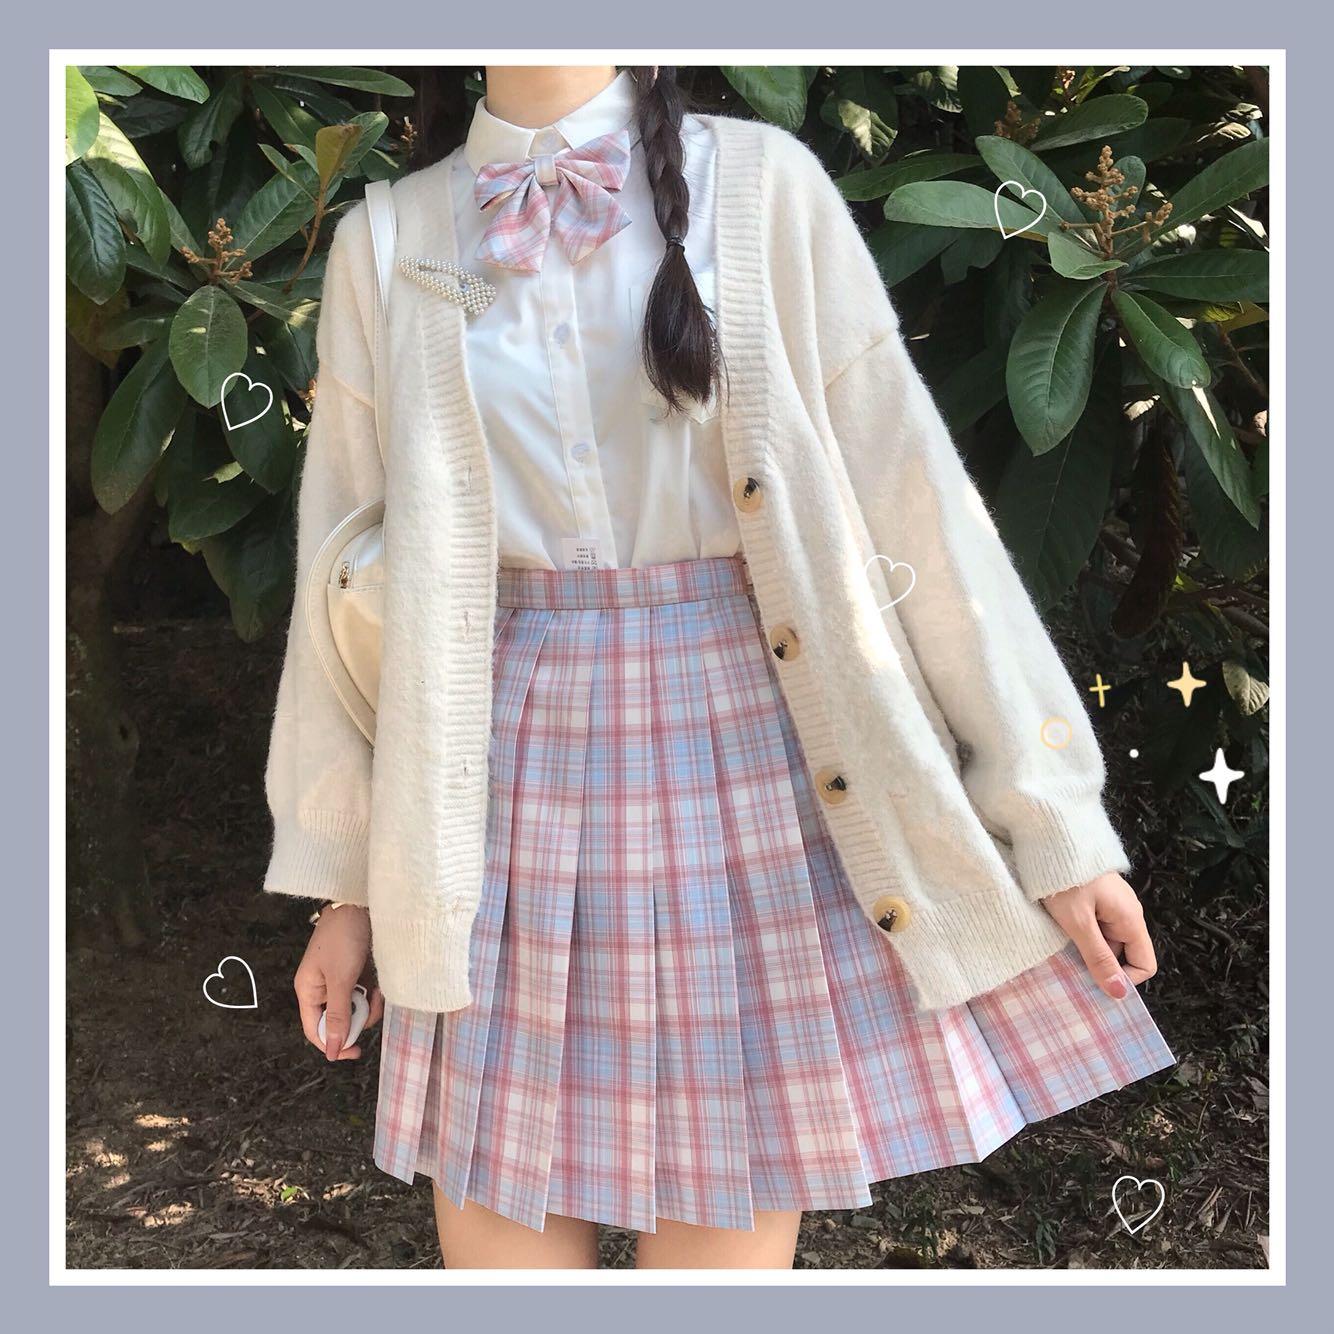 (Deposit) Peach Blossom Drunk Original JK Lattice Skirt 5 Mission